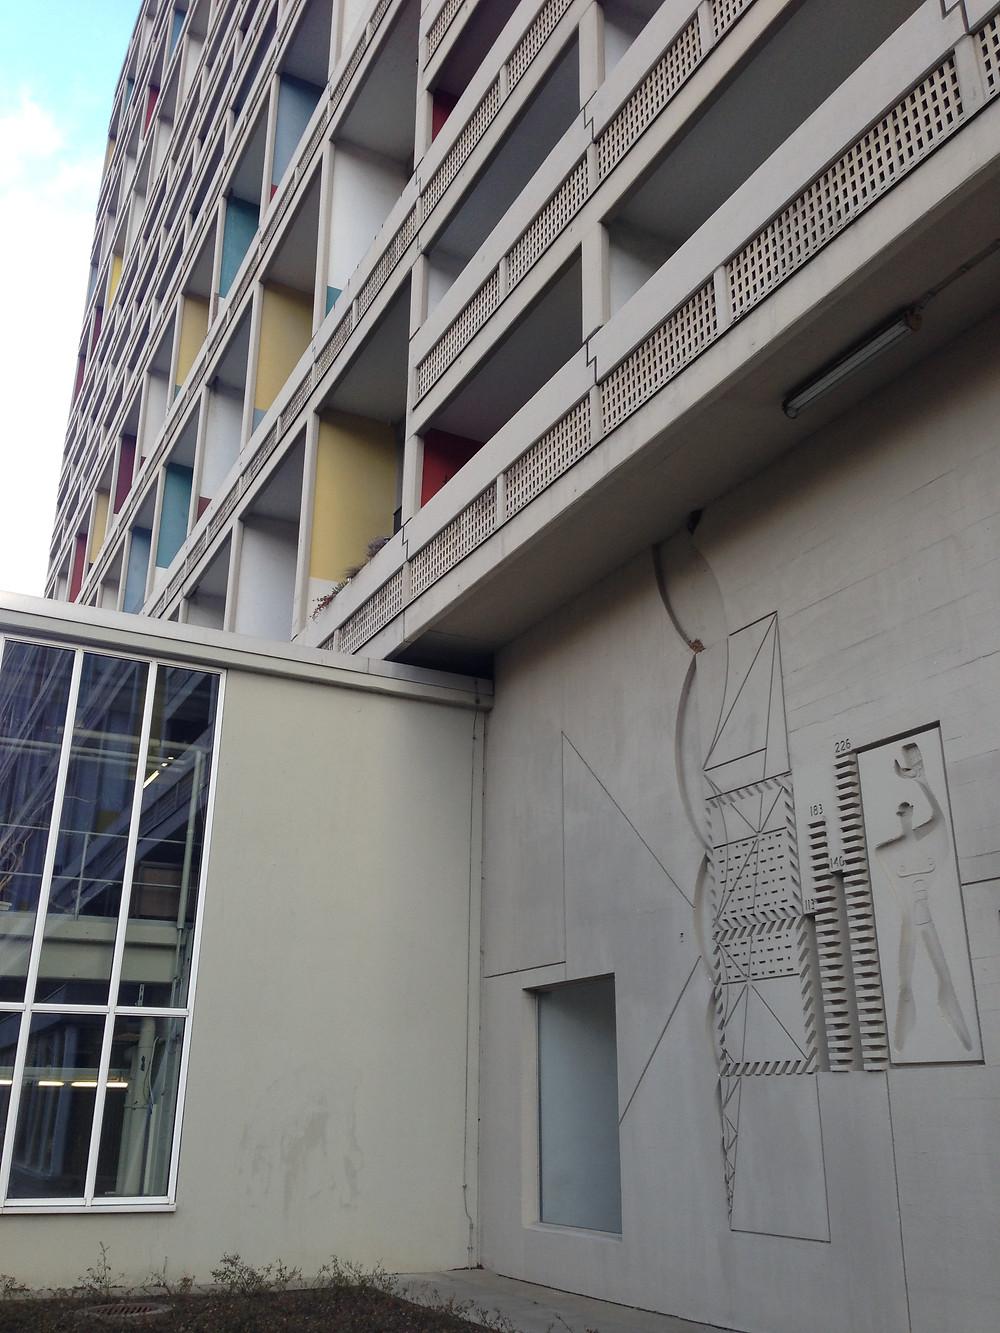 Corbusierhaur